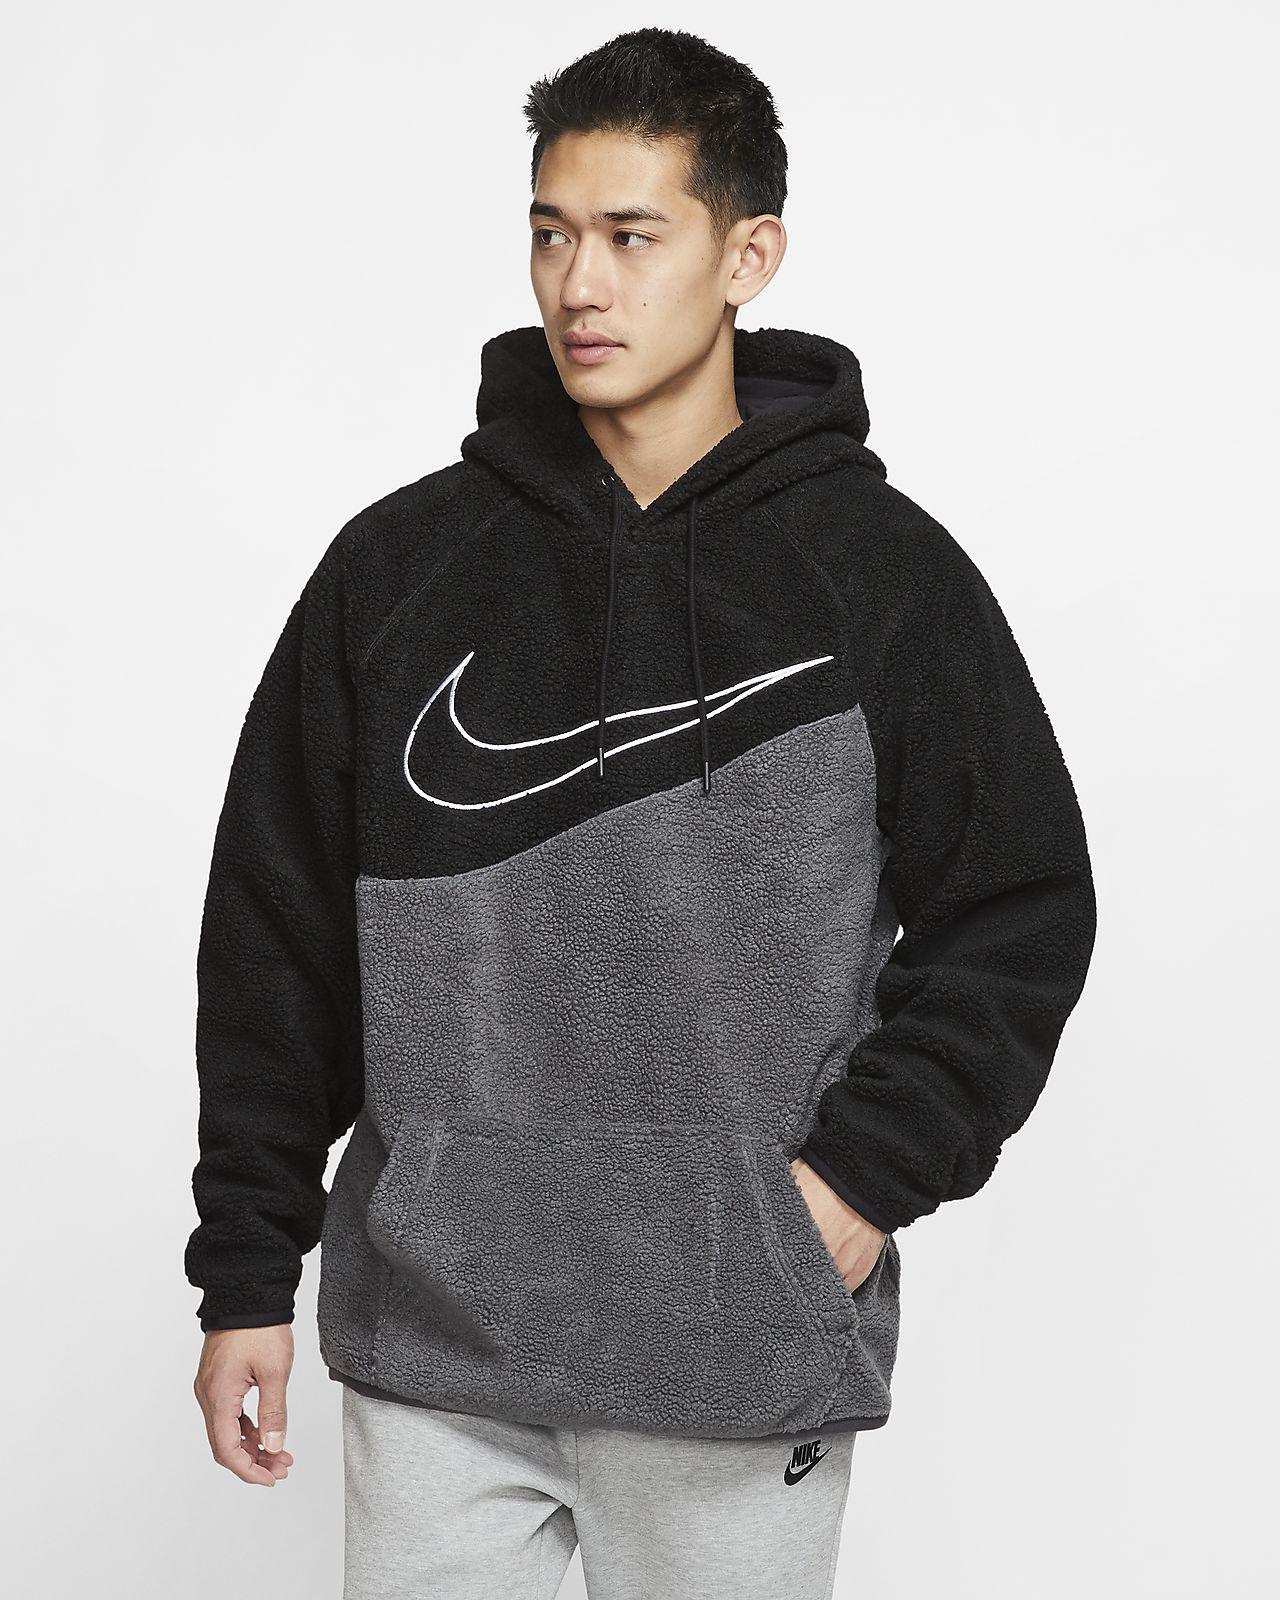 cheaper hot products new list Nike Sportswear Swoosh Sherpa Pullover Hoodie. Nike.com